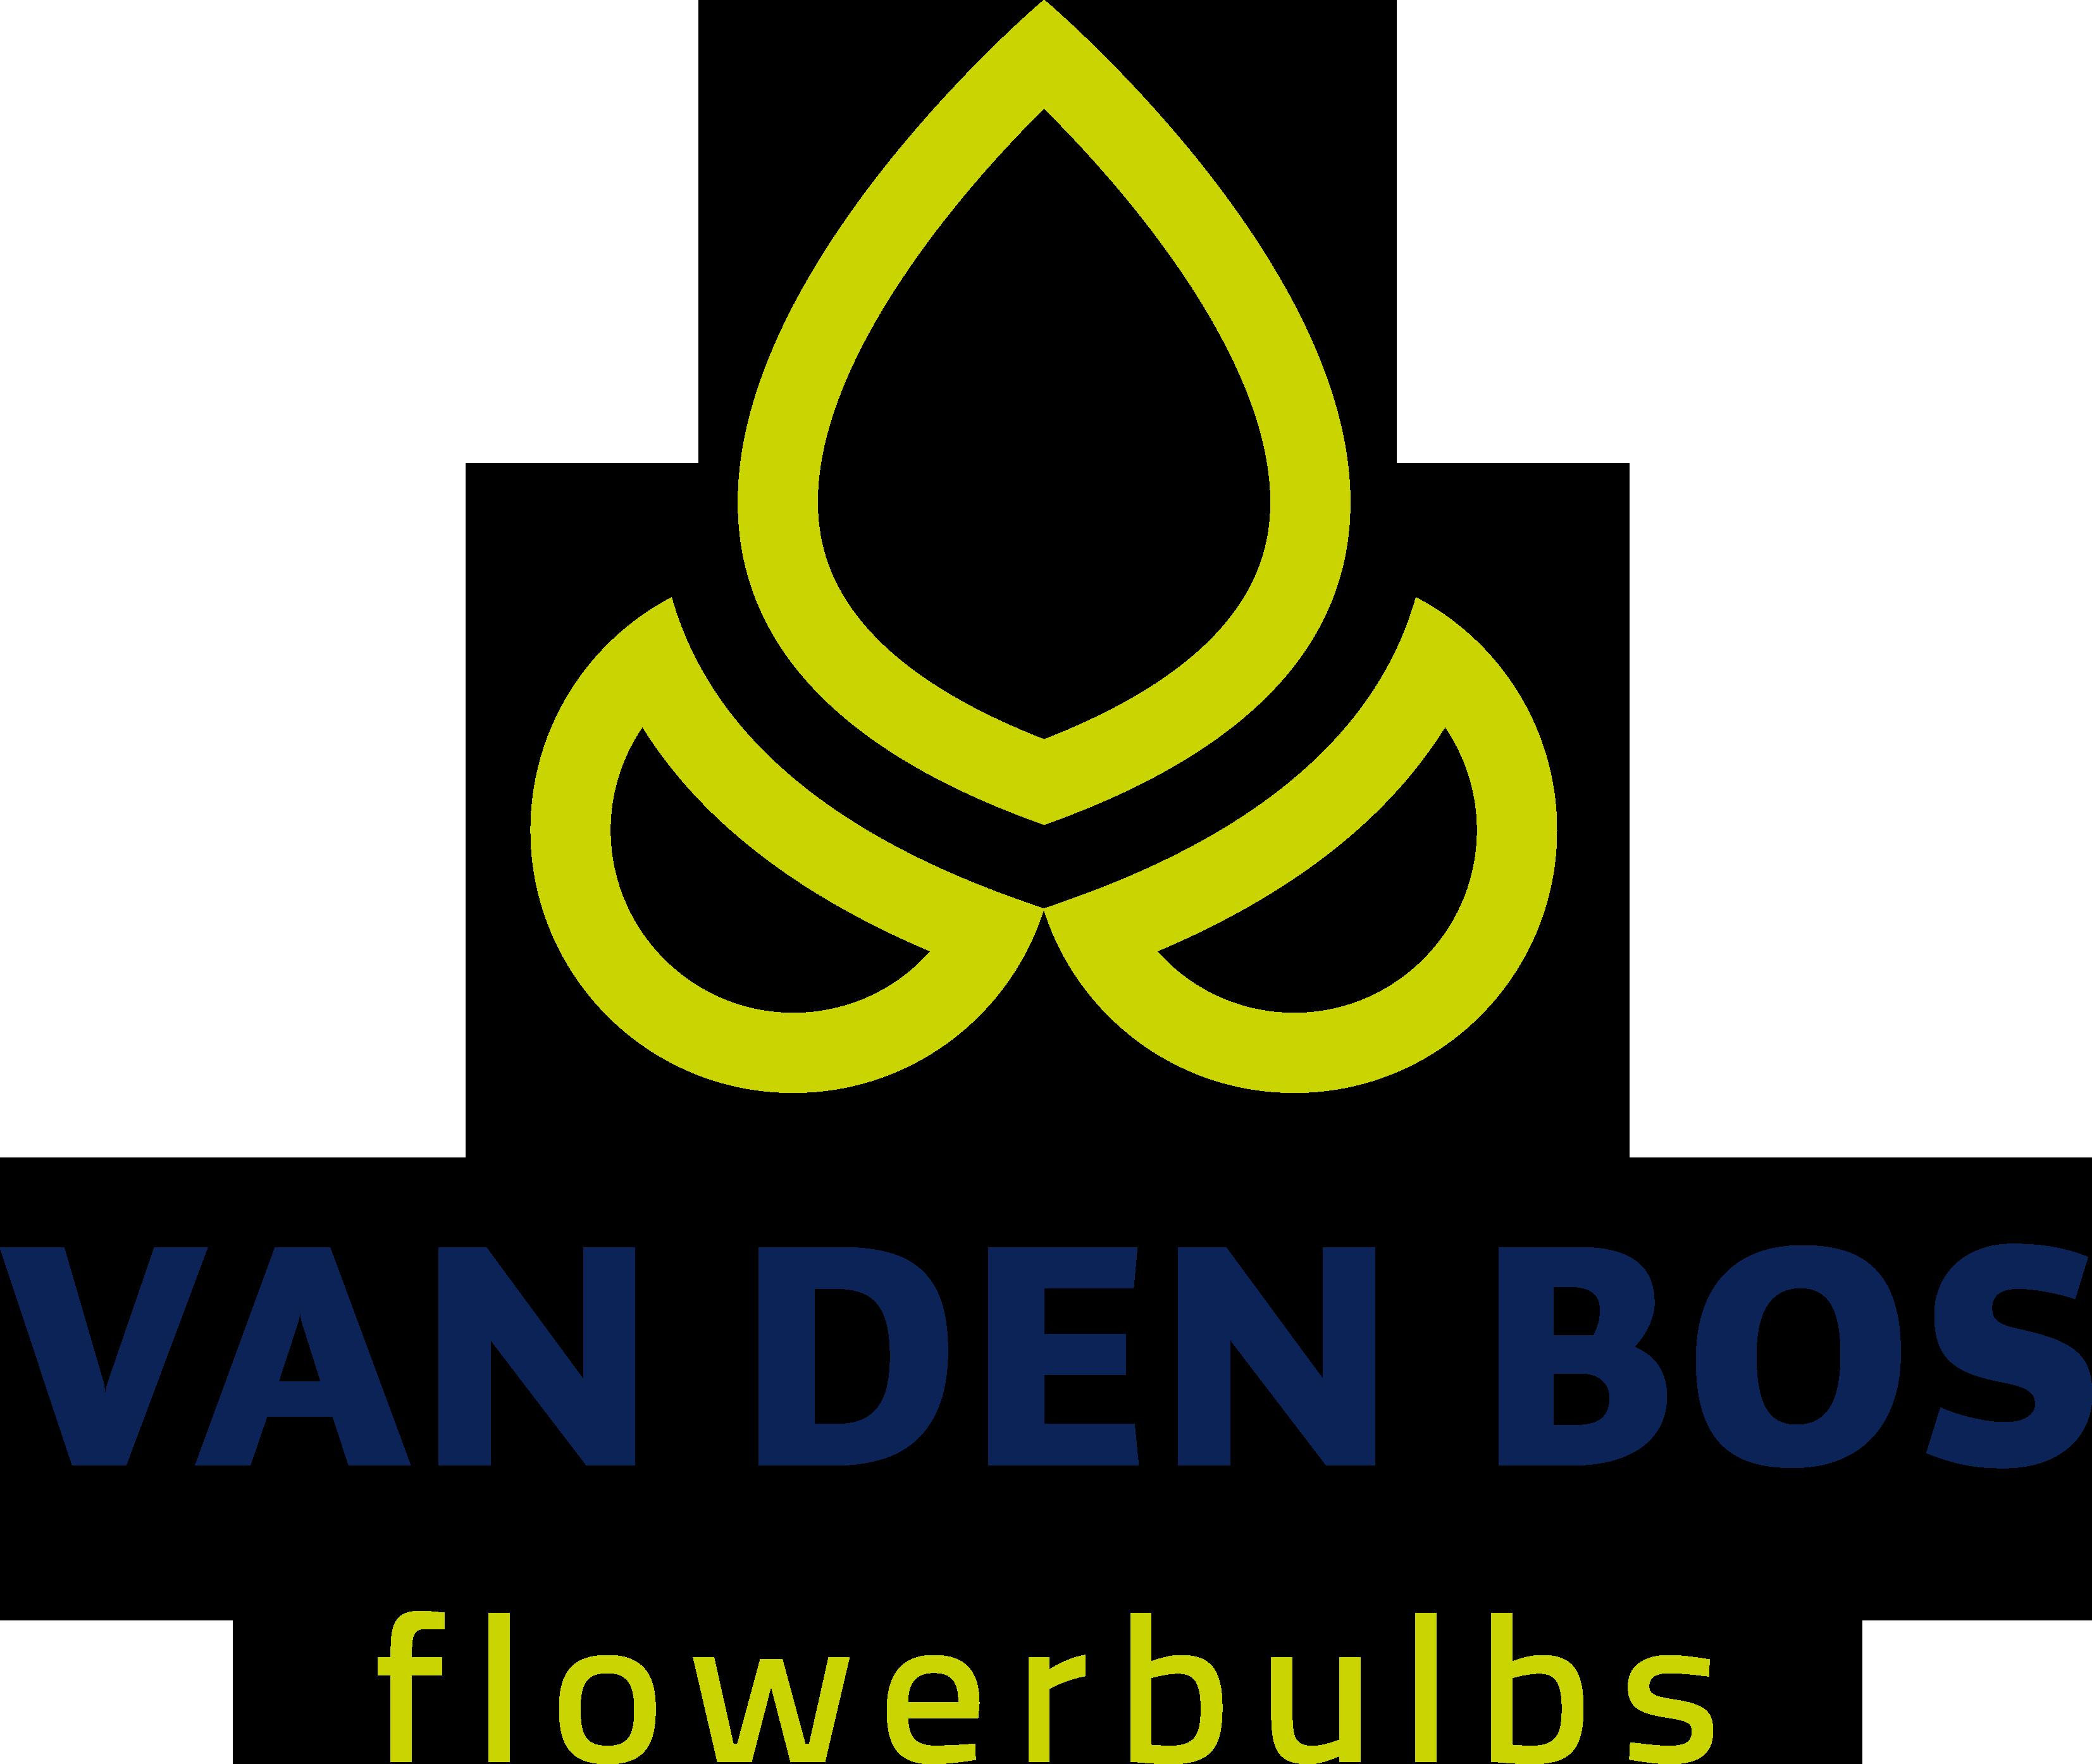 Logo Van den Bos Flowerbulbs